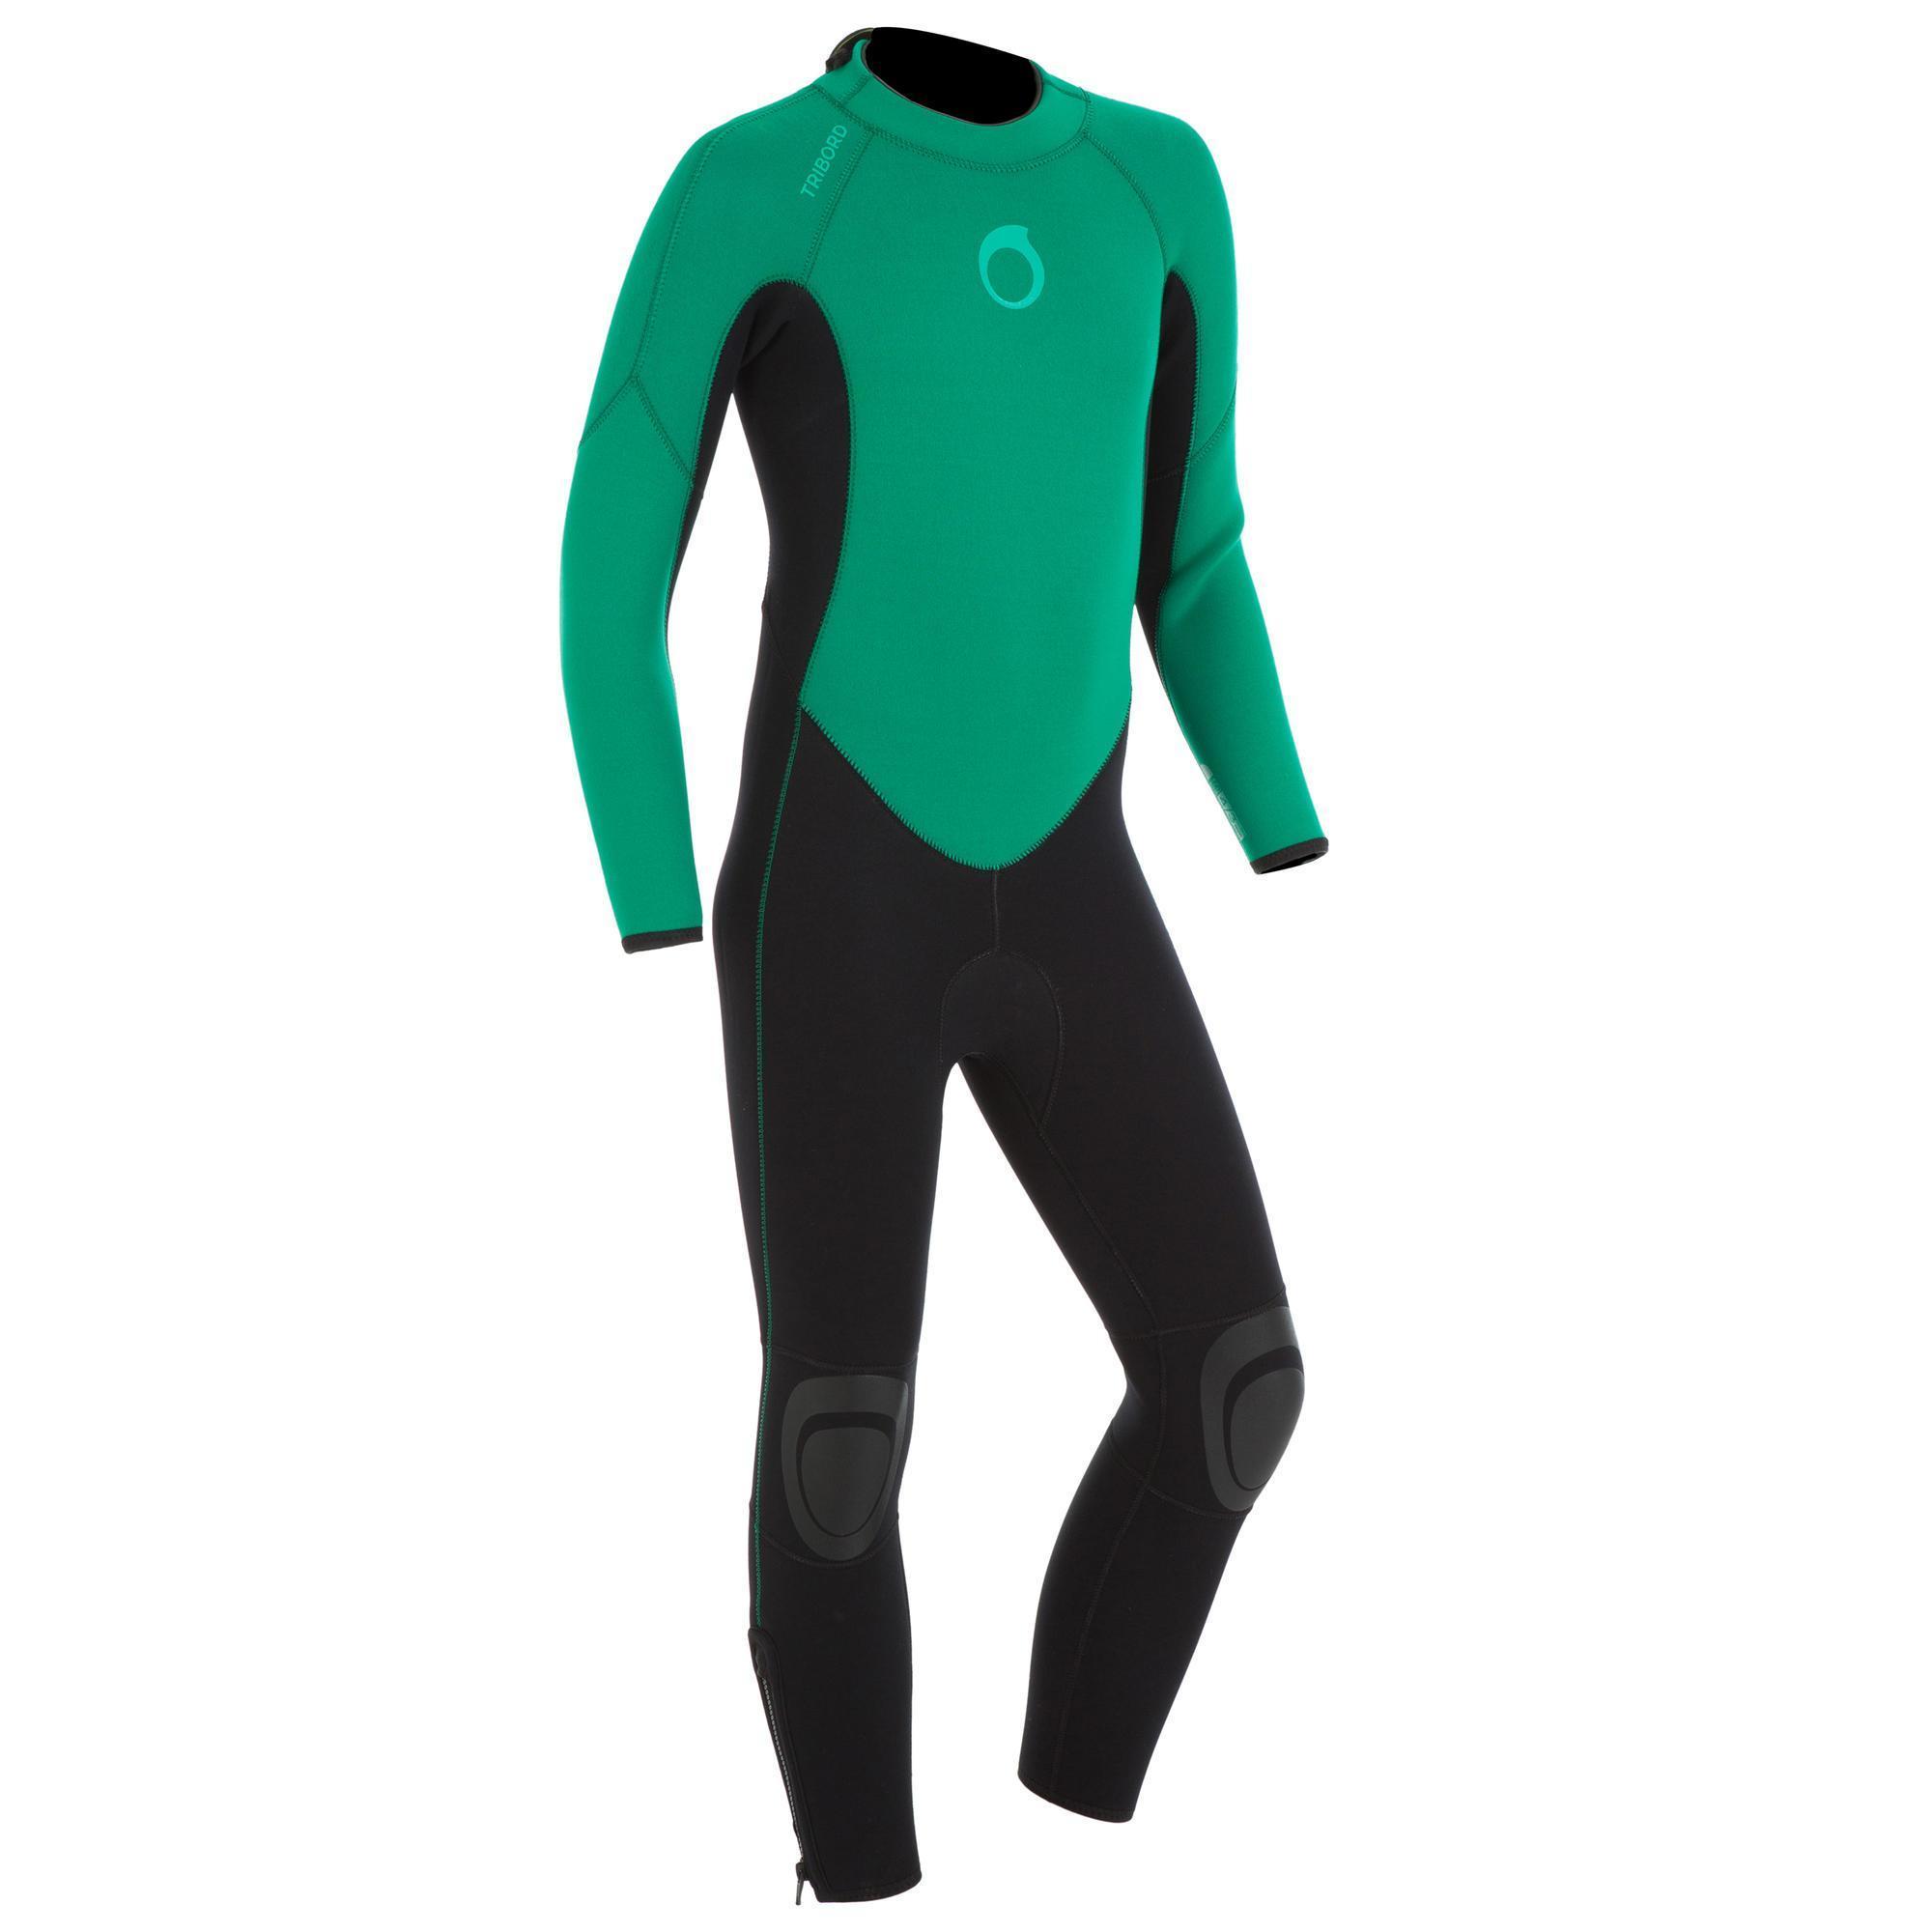 Comprar Trajes de Neopreno de Surf Online  67de5e577cd